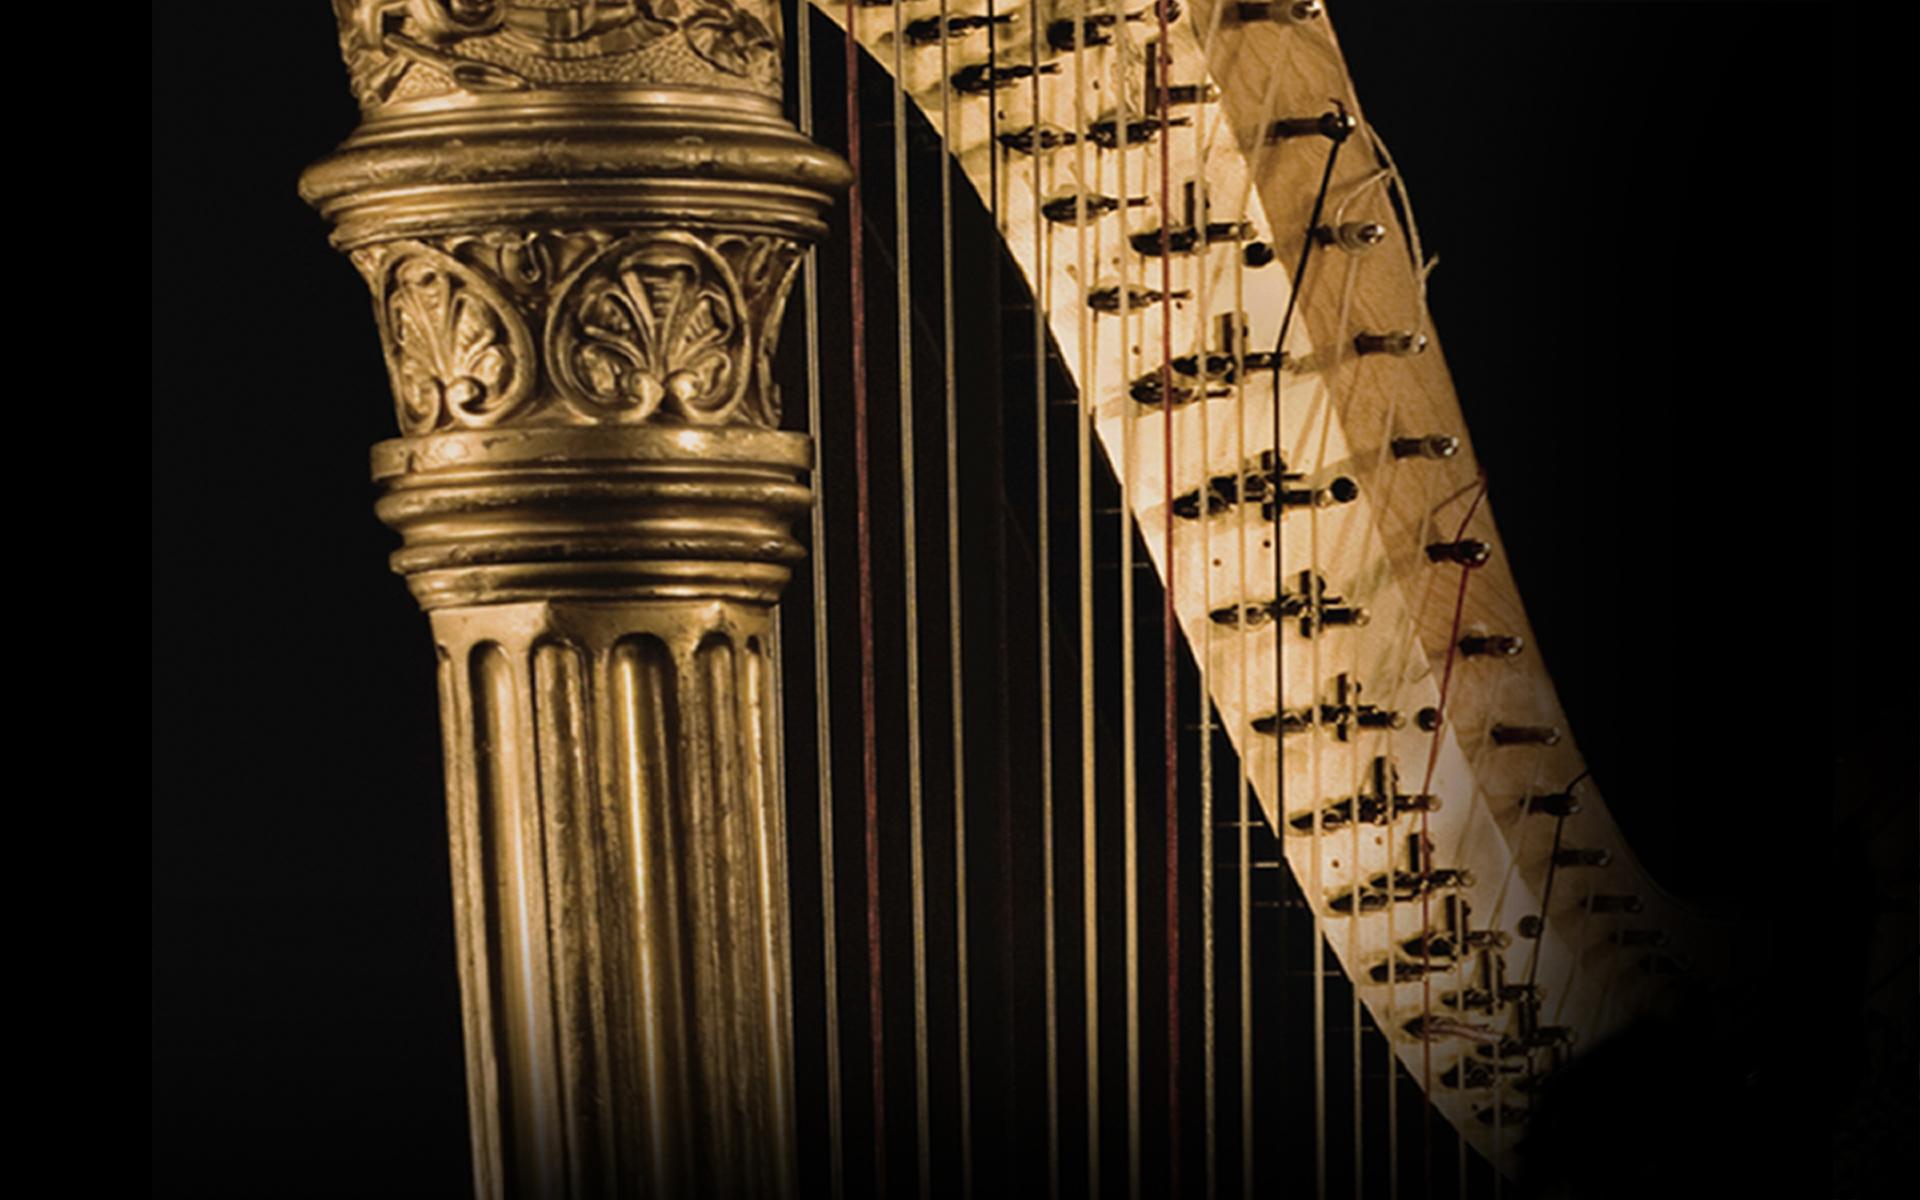 download harp HD Wallpaper General 285629 [1920x1200] for 1920x1200